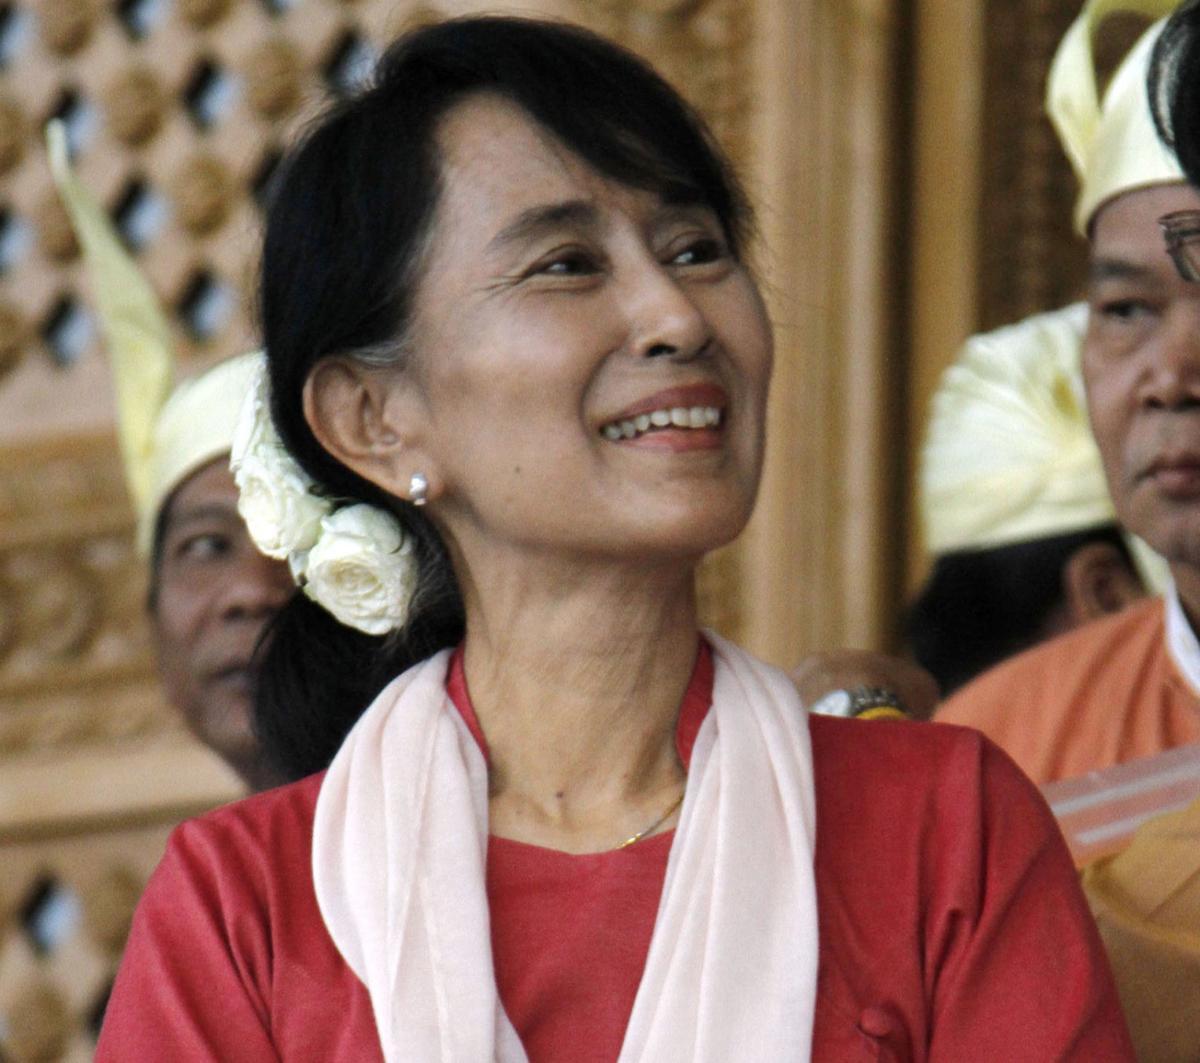 Suu Kyi to visit U.S. for award